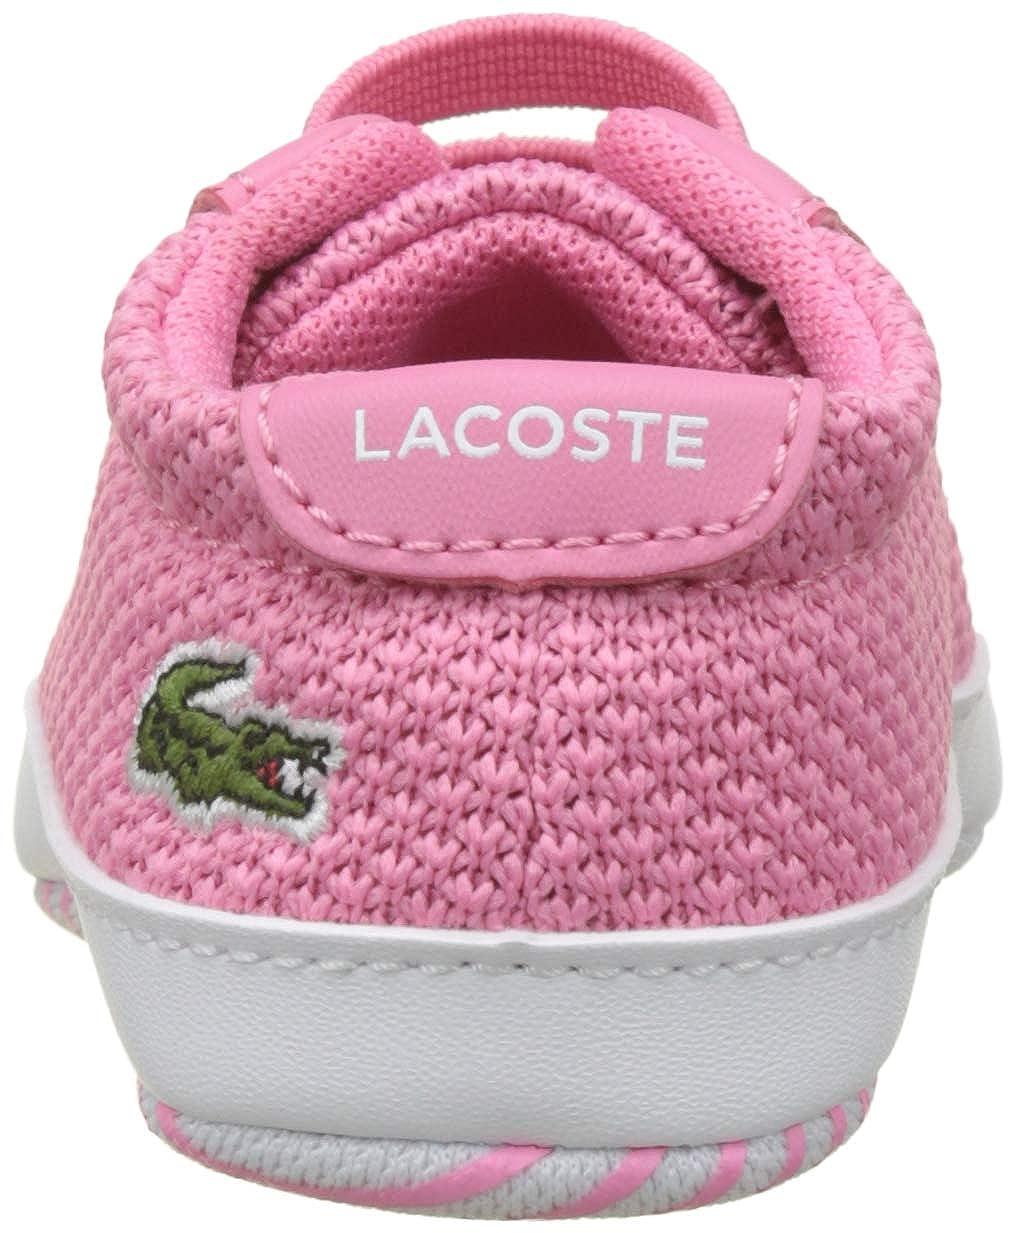 21043bc7414e7 Lacoste Unisex Babies  L.12.12 Crib 318 1 Cab Birth Shoes  Amazon.co.uk   Shoes   Bags